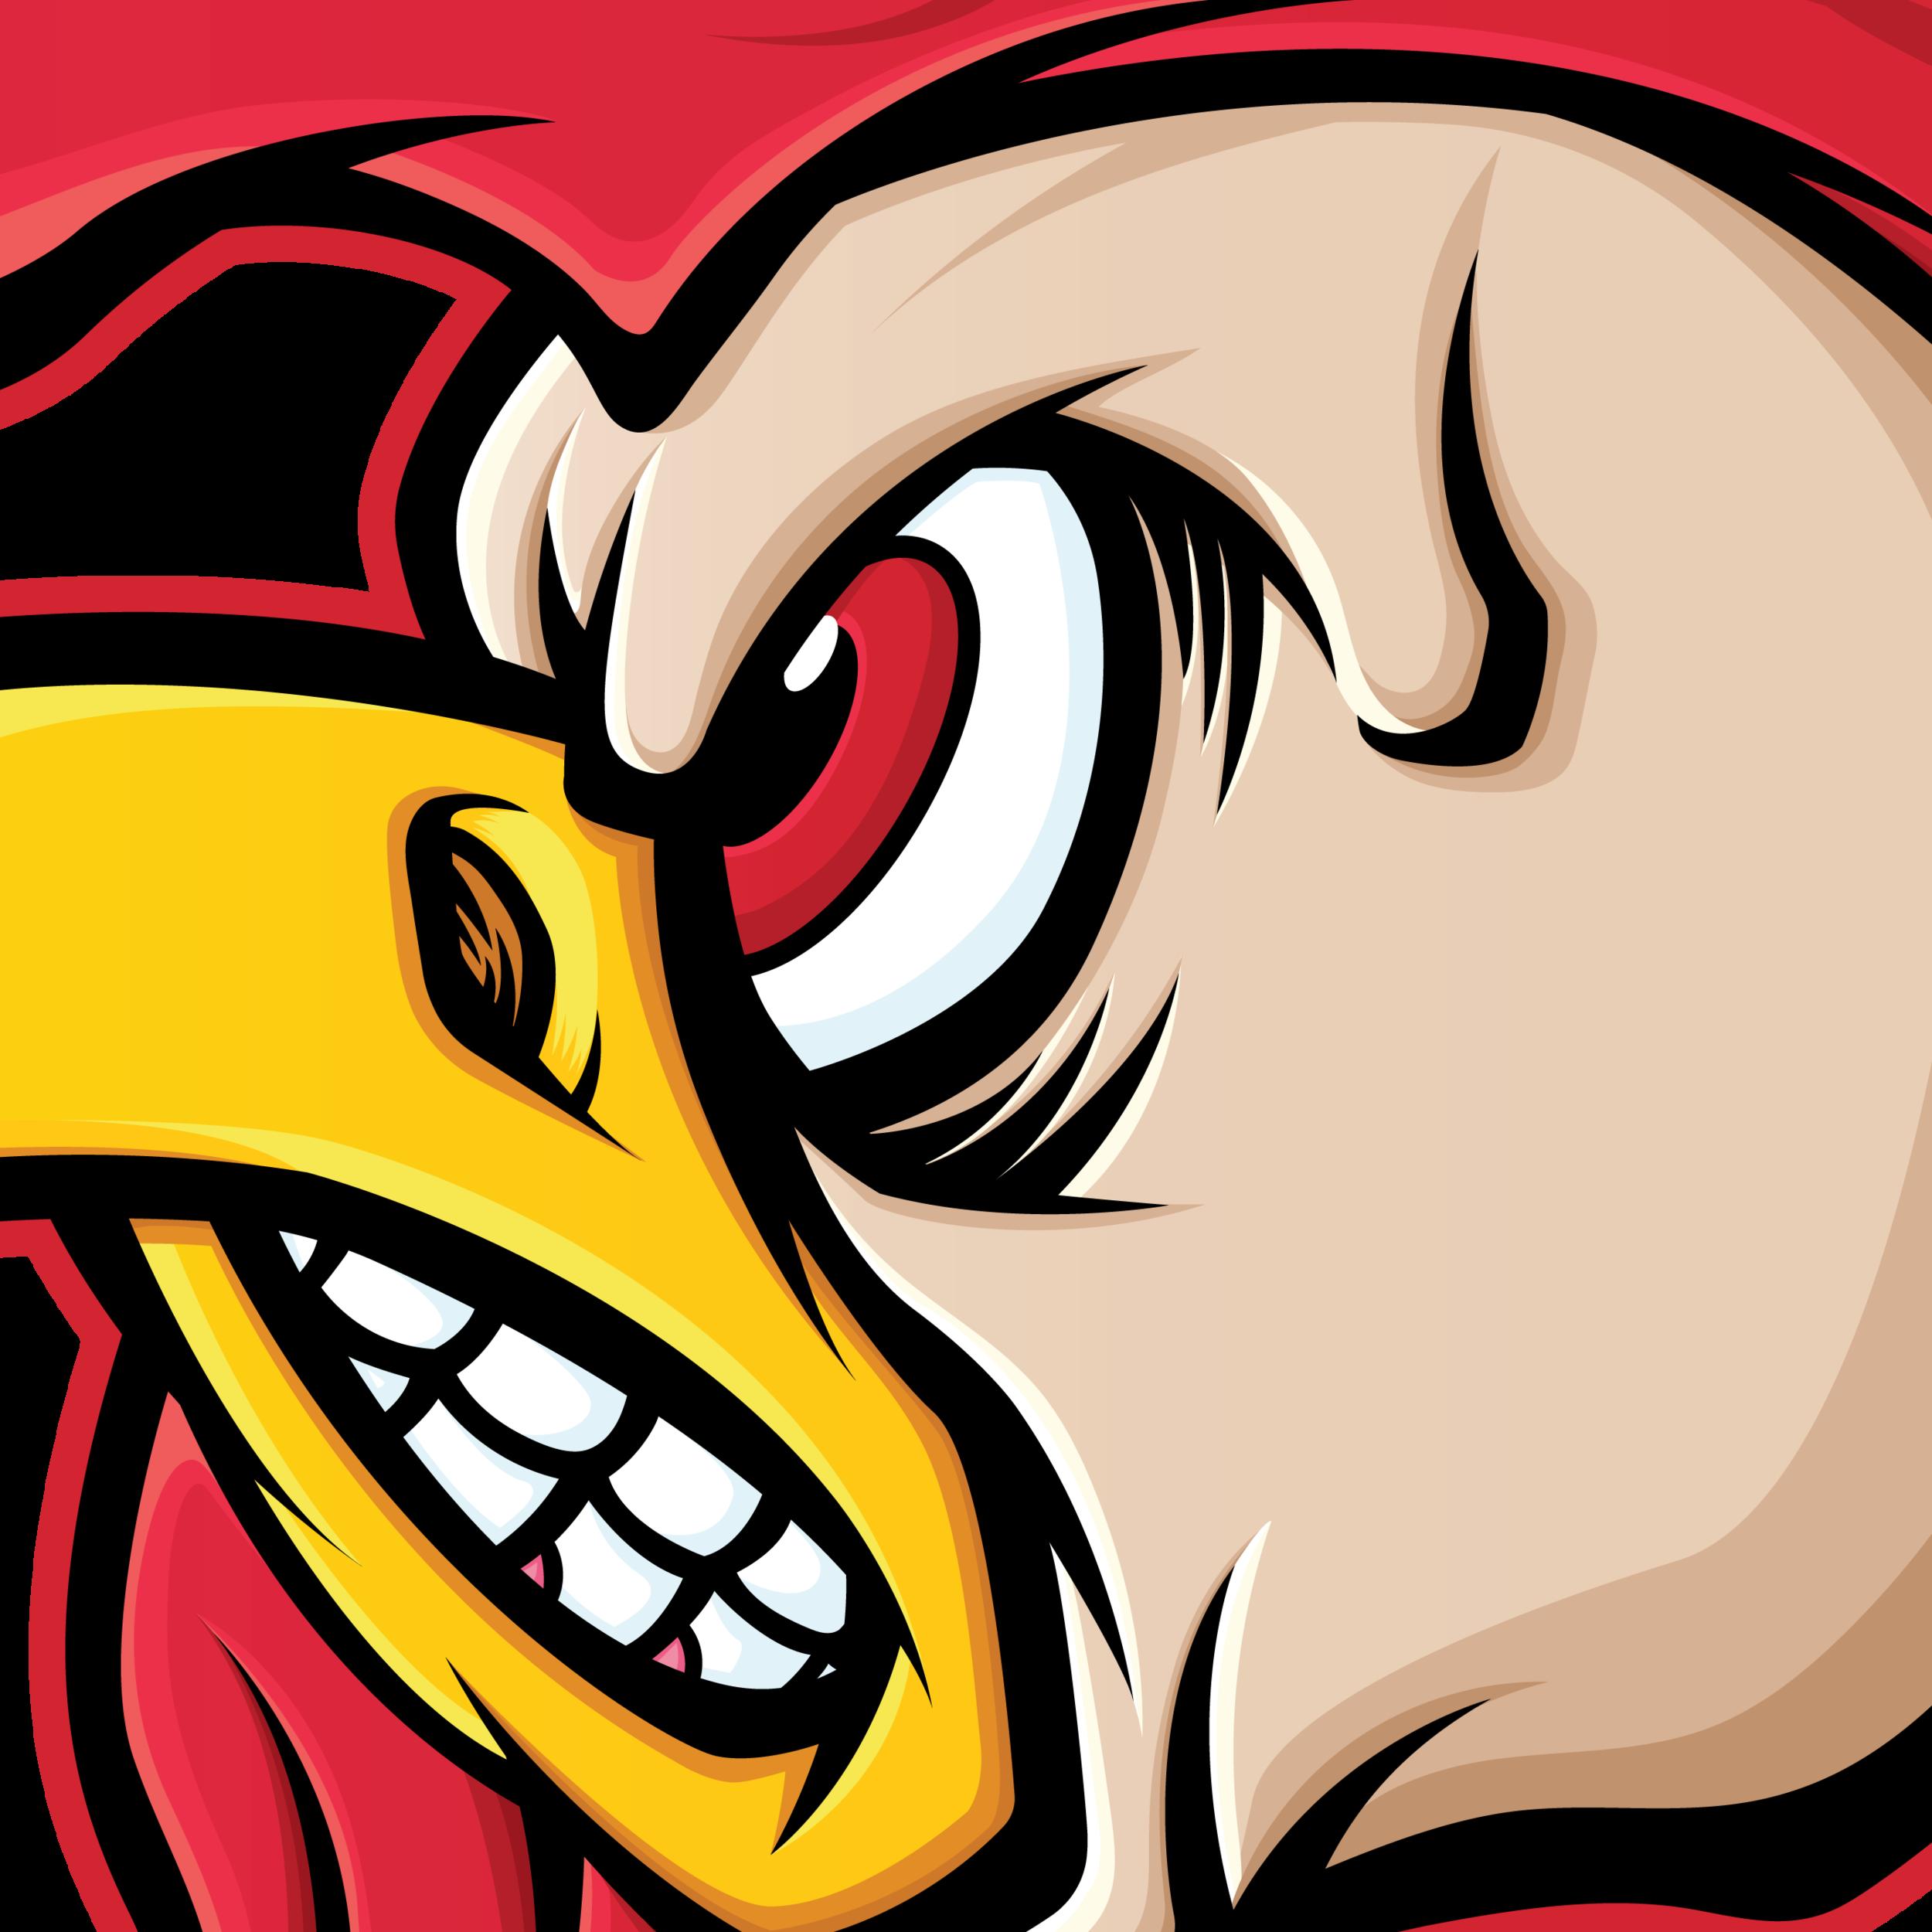 ODS-Rooster-vector-illustration-illustrator-sticker-art-roberto-orozco-artist-orozcodesign-close.jpg